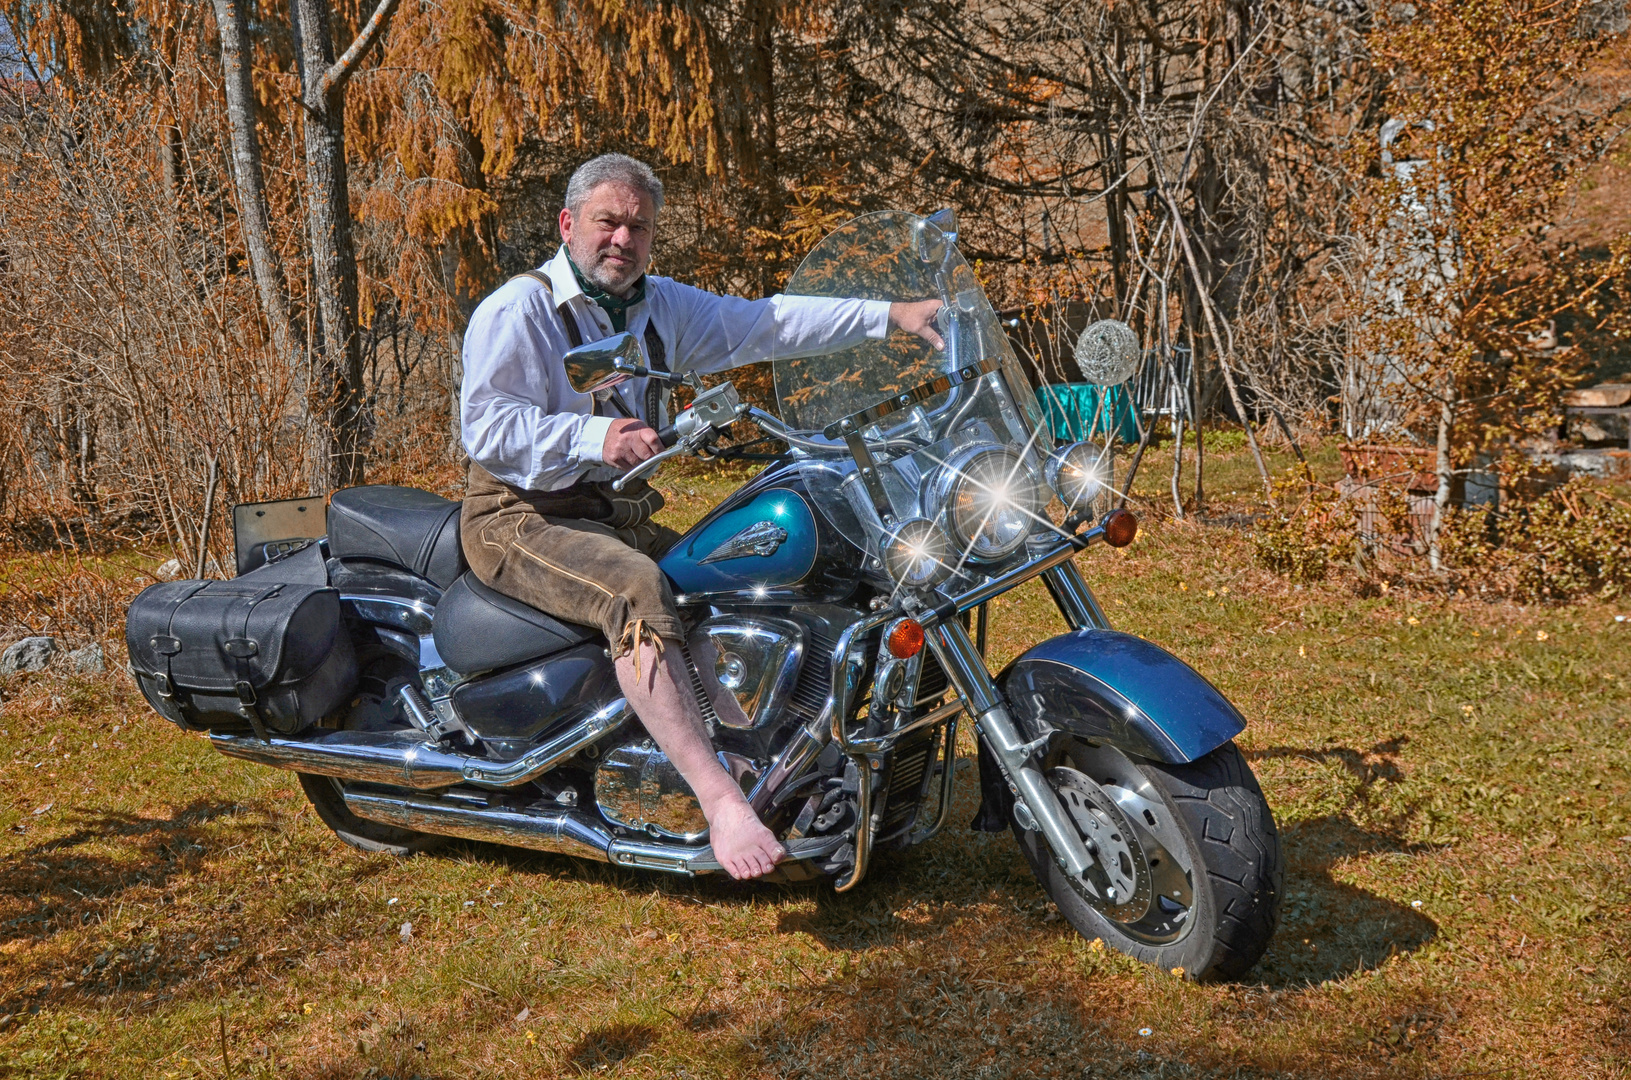 Bavarian Rider